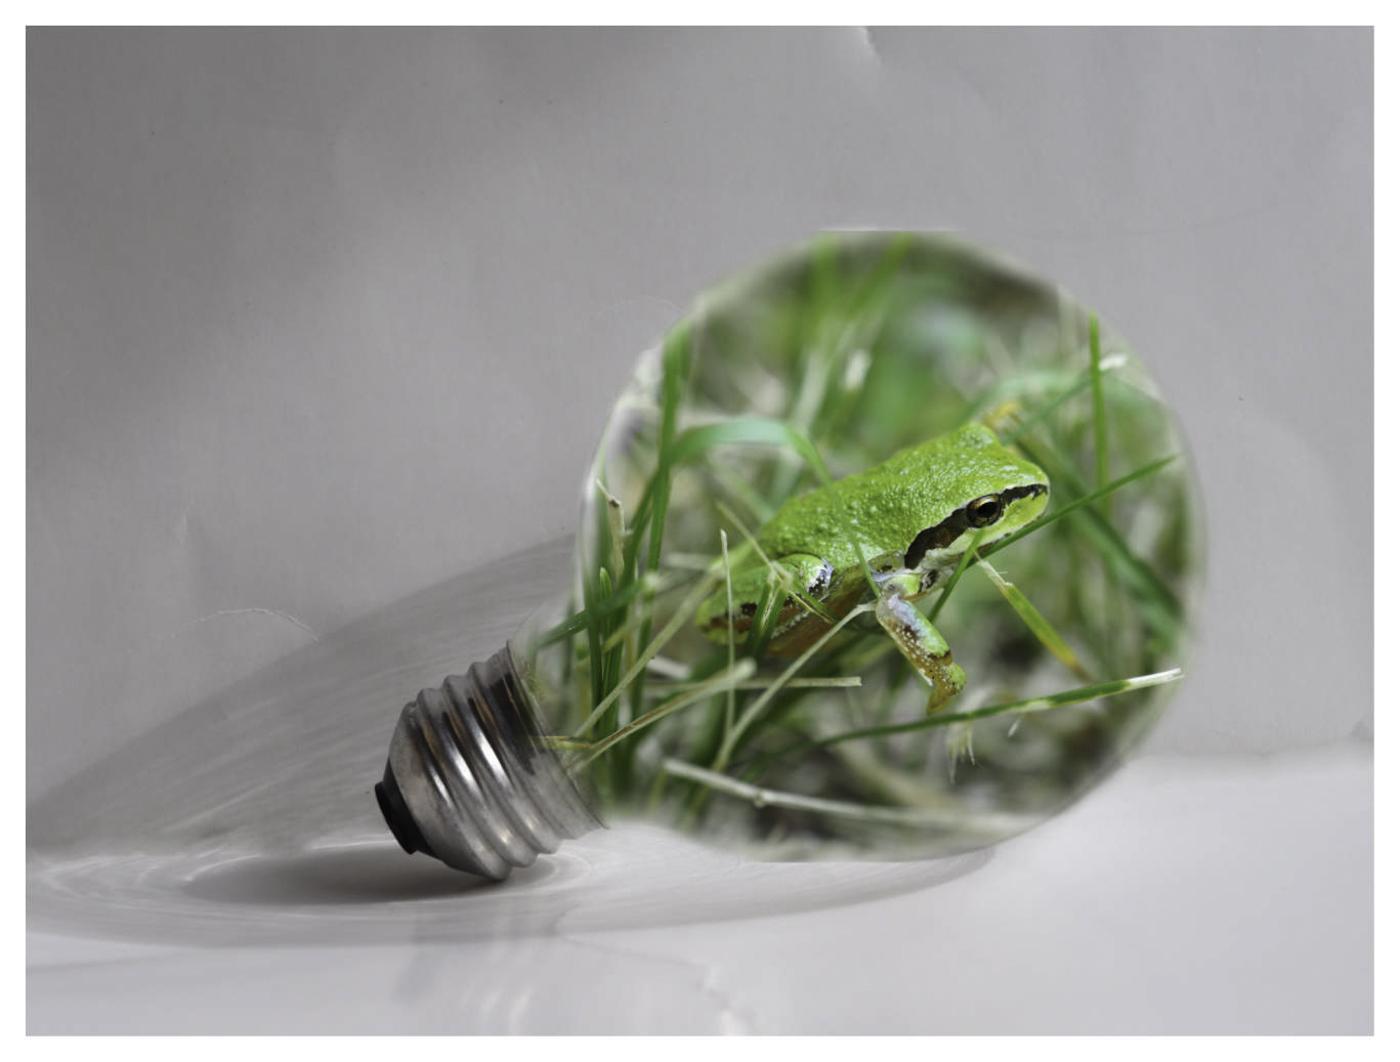 Frog in a Light Bulb - Kevin Haggkvist